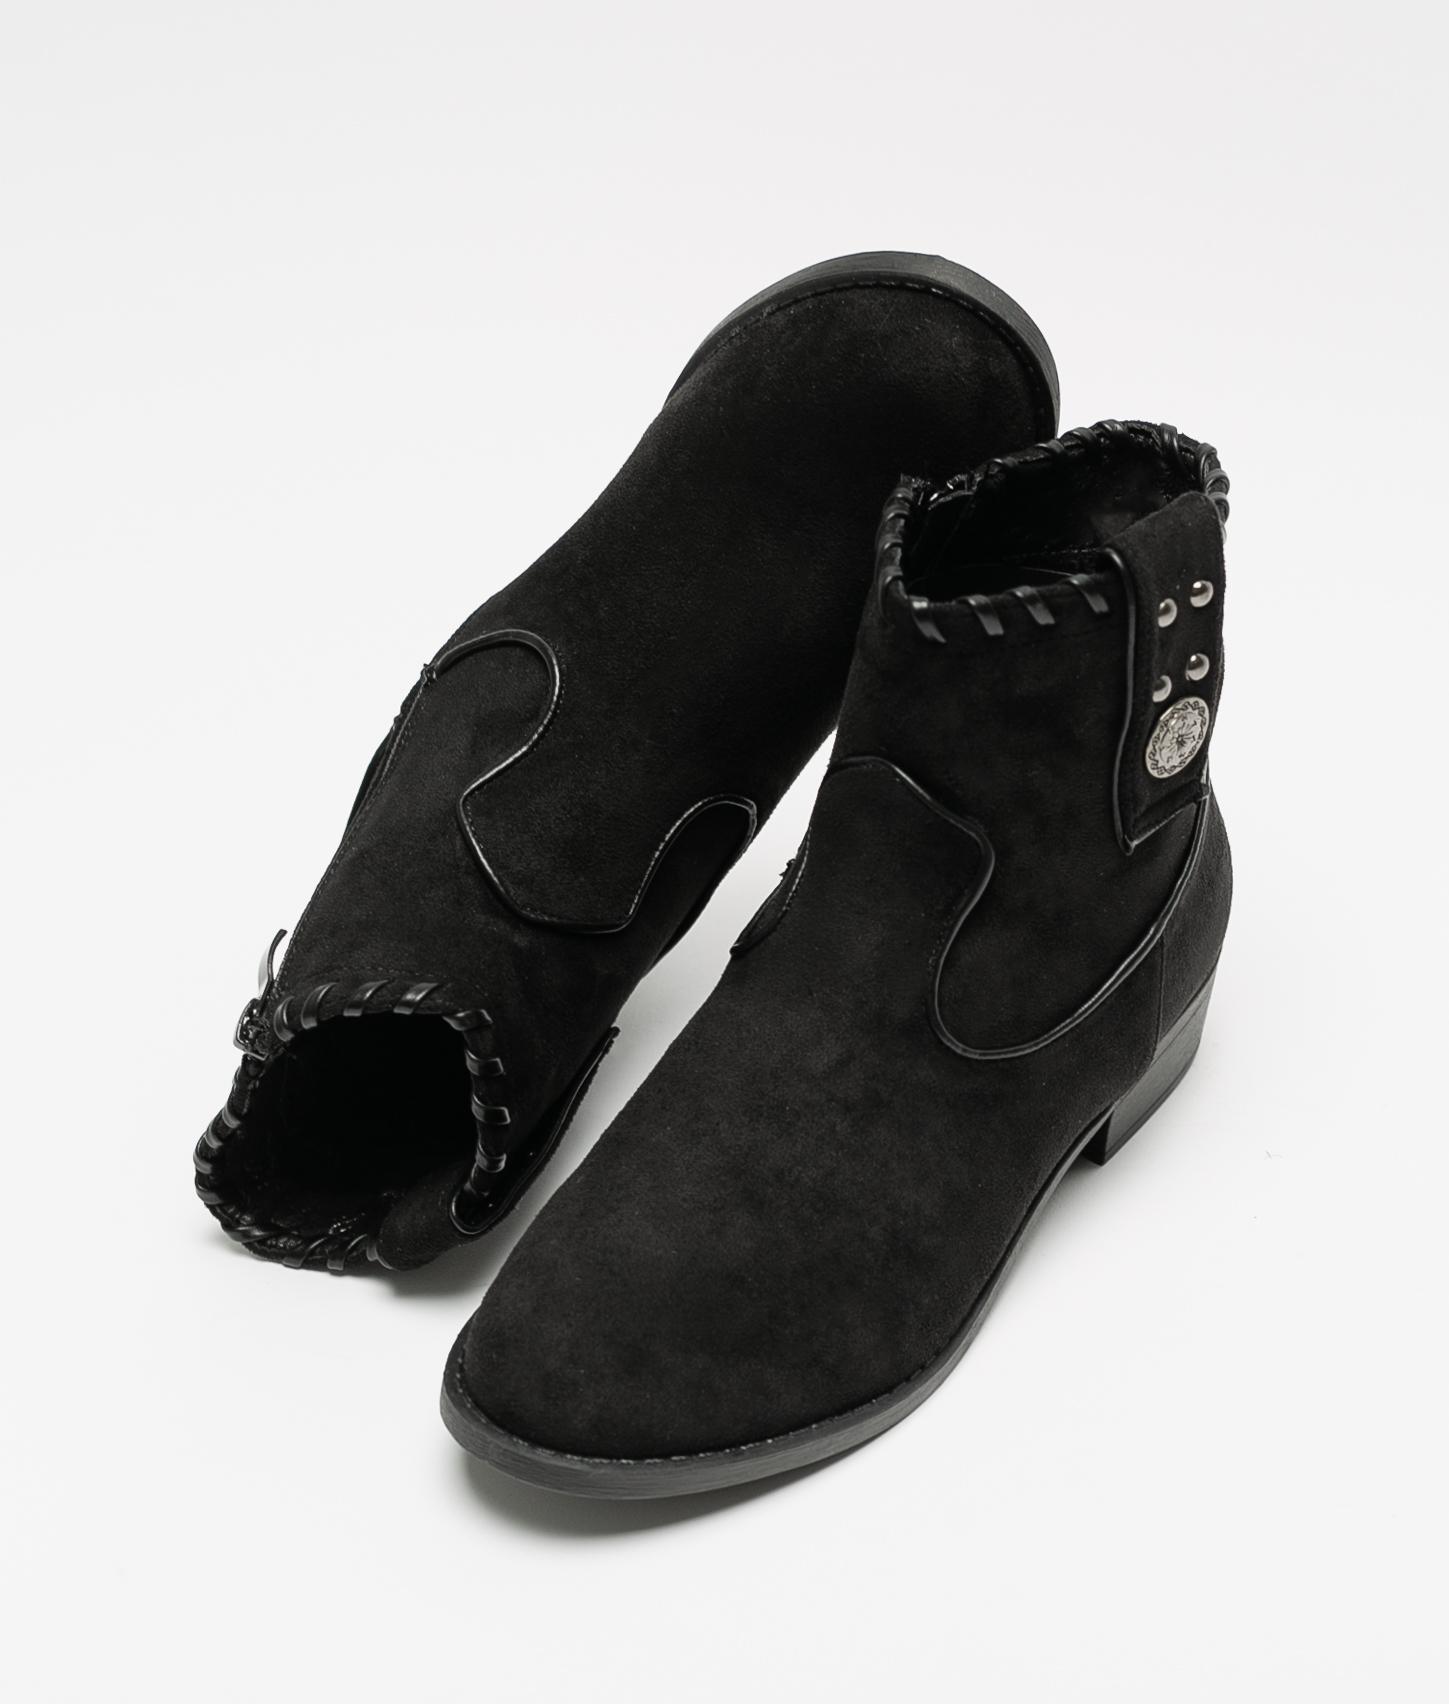 Bota Baja Relu - Noir